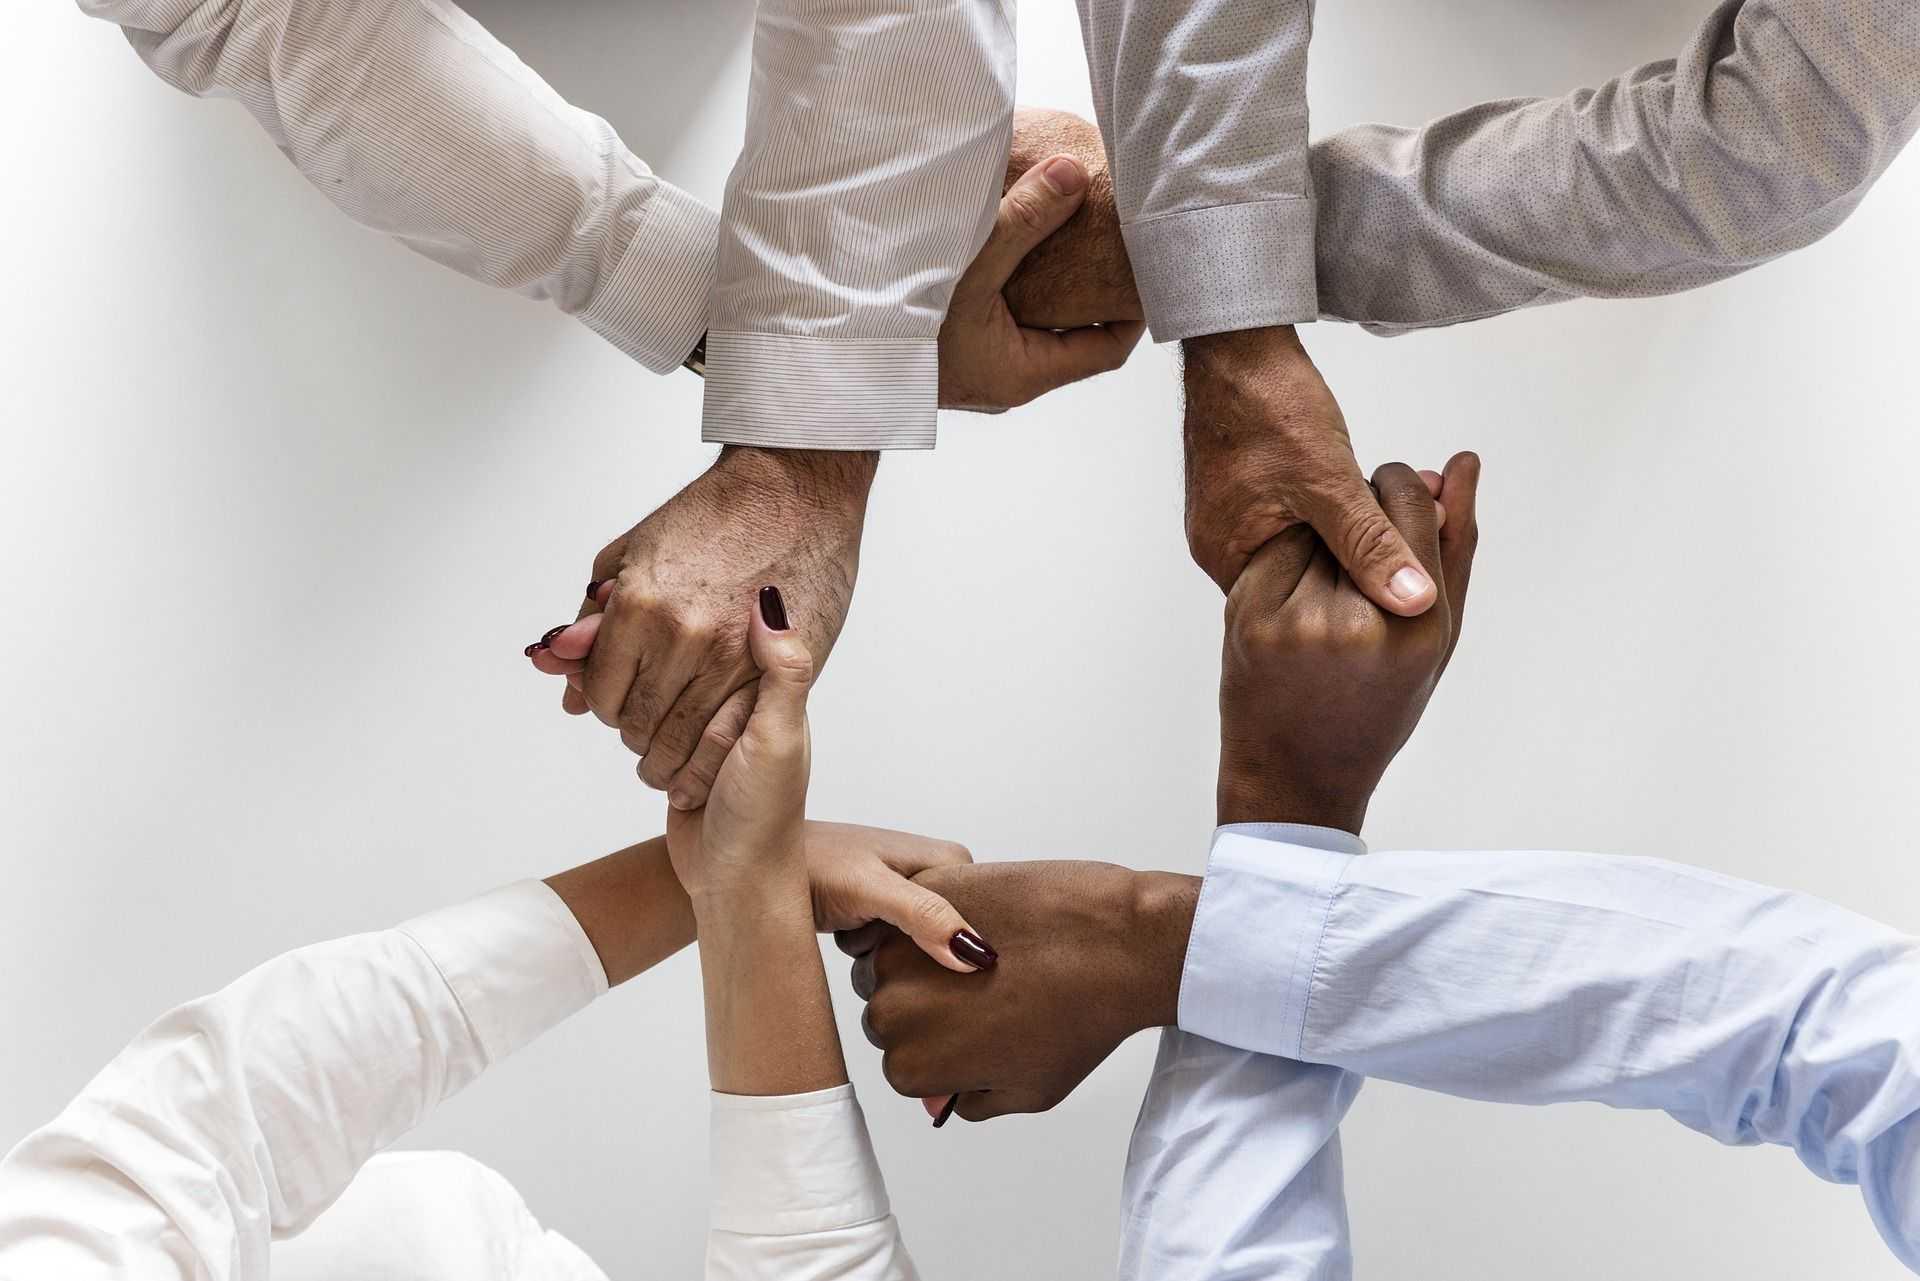 Isabell Zeiske - culture, international joint venture, intercultural management, cross-cultural management, Kultur, Kulturmanagement, cross-cultural leadership, intercultural leadership, corporate culture, Unternehmenskultur